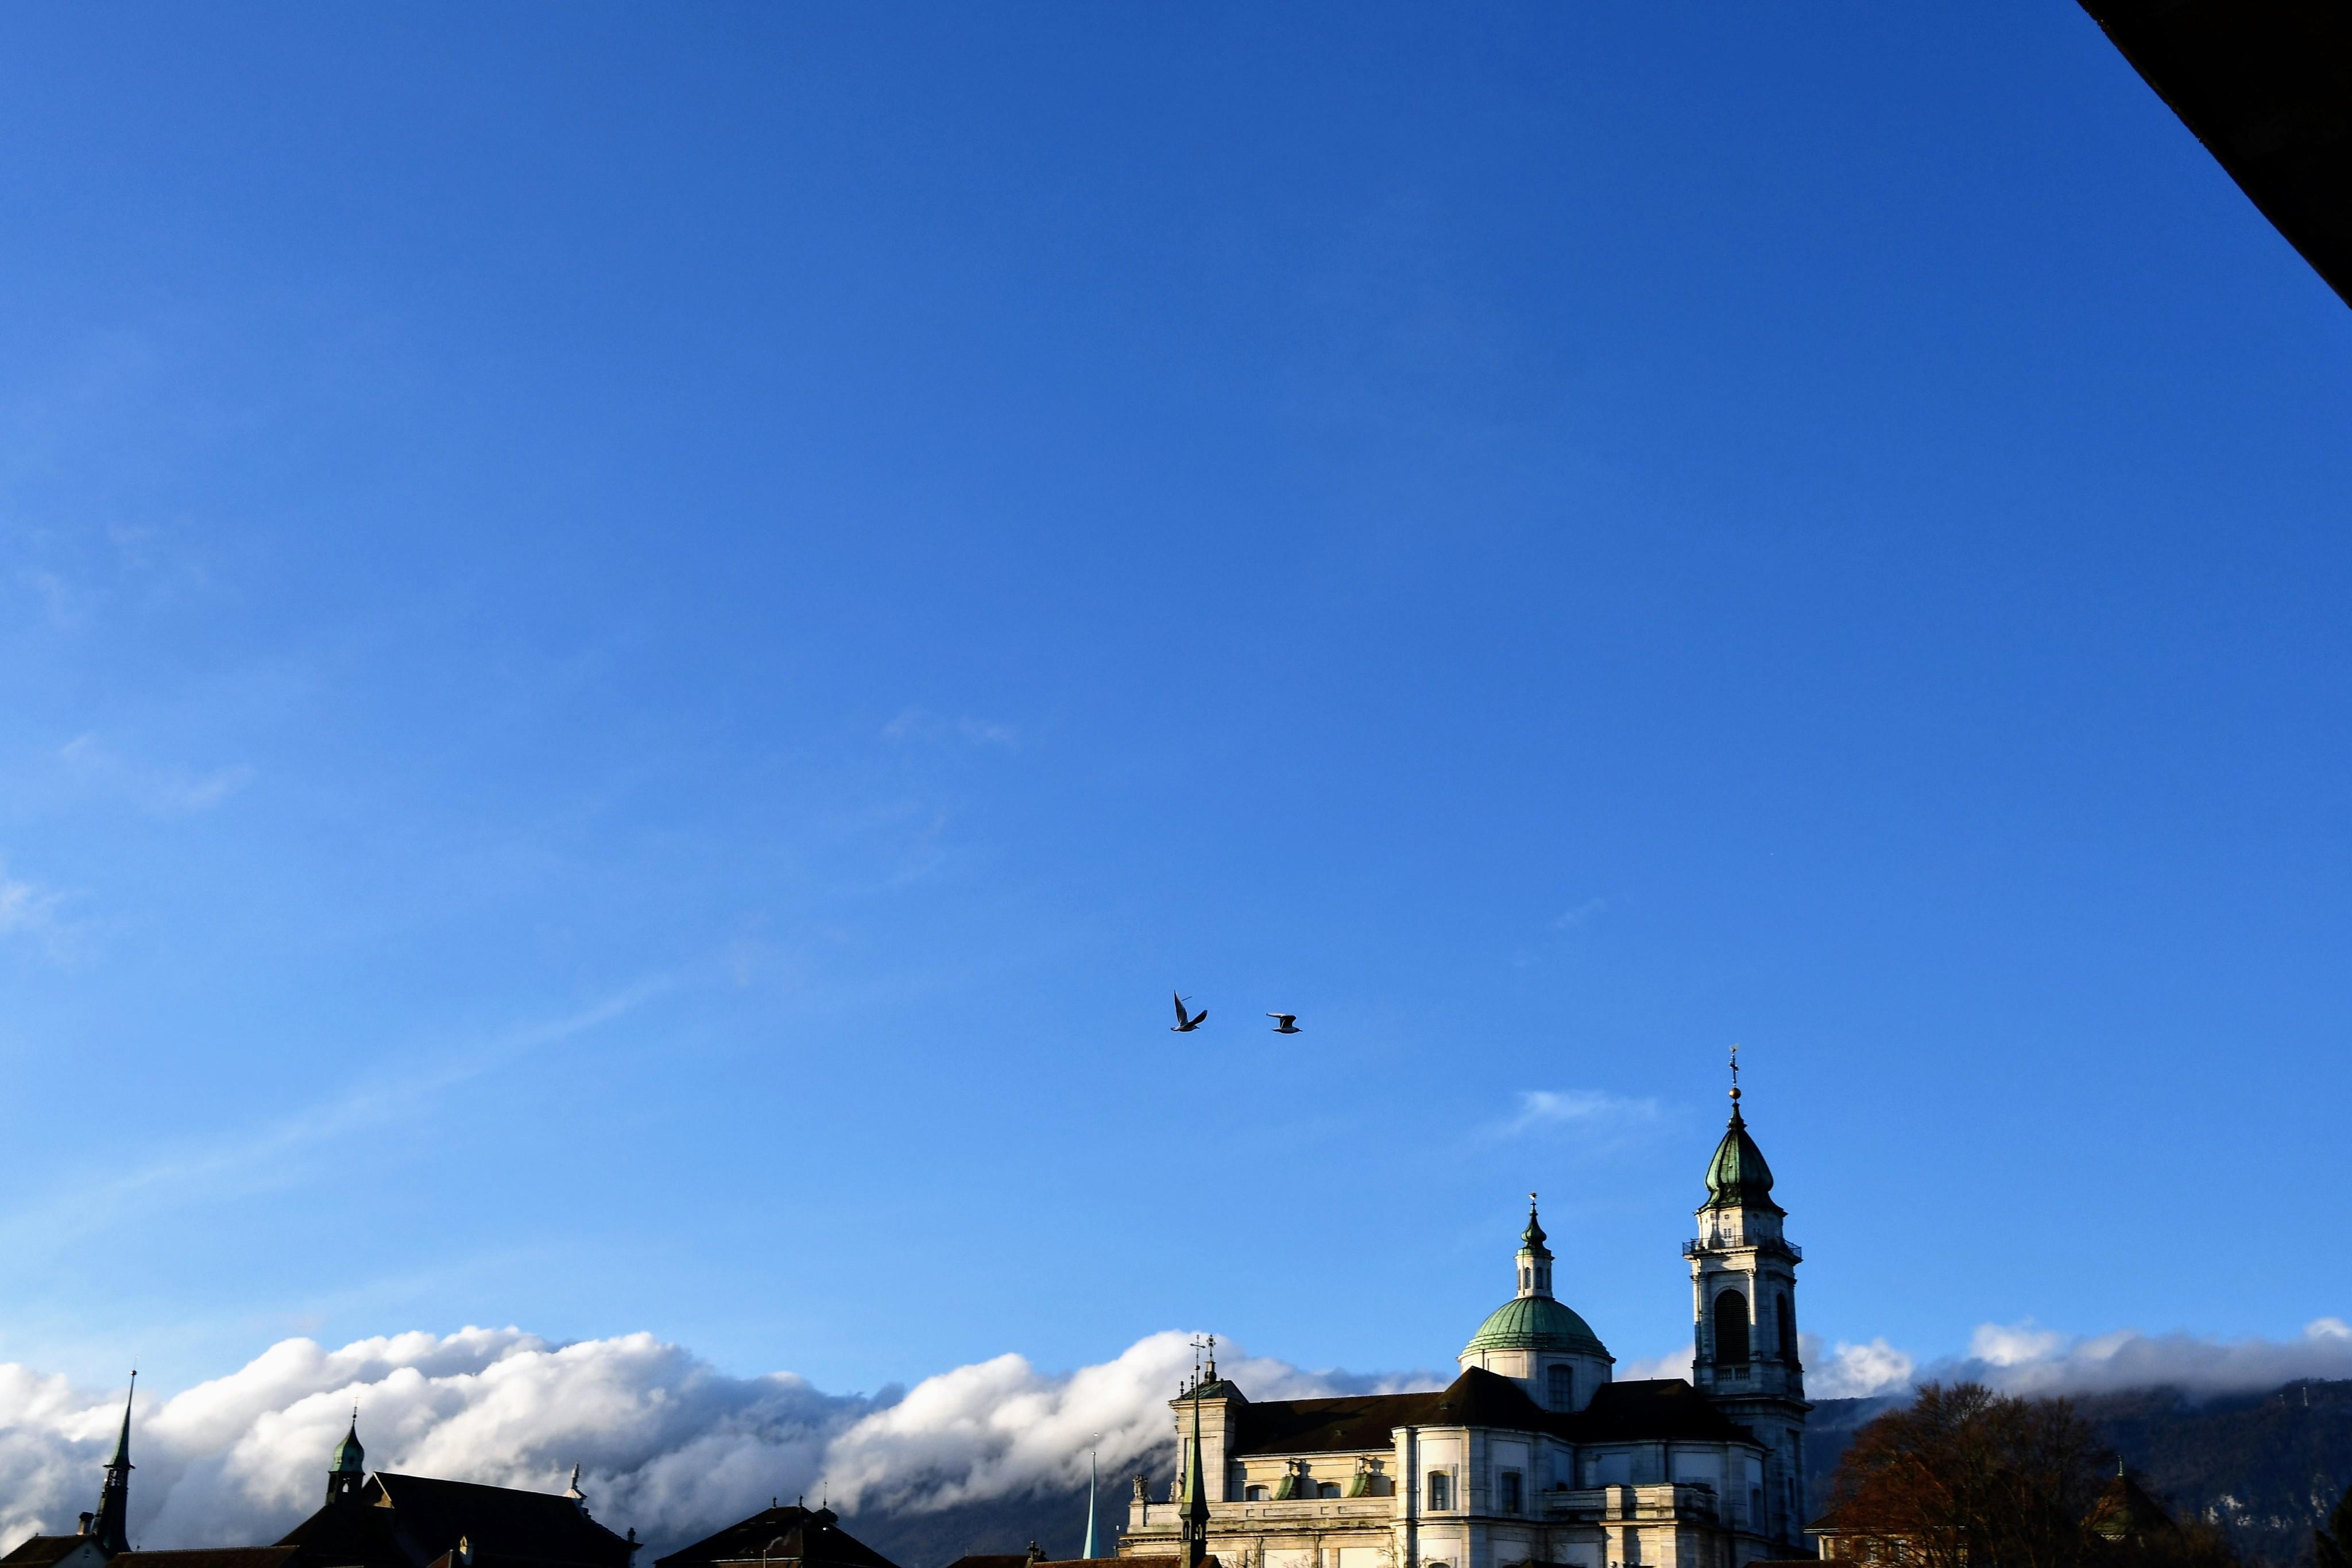 clouds-over-solothur-21.12-3